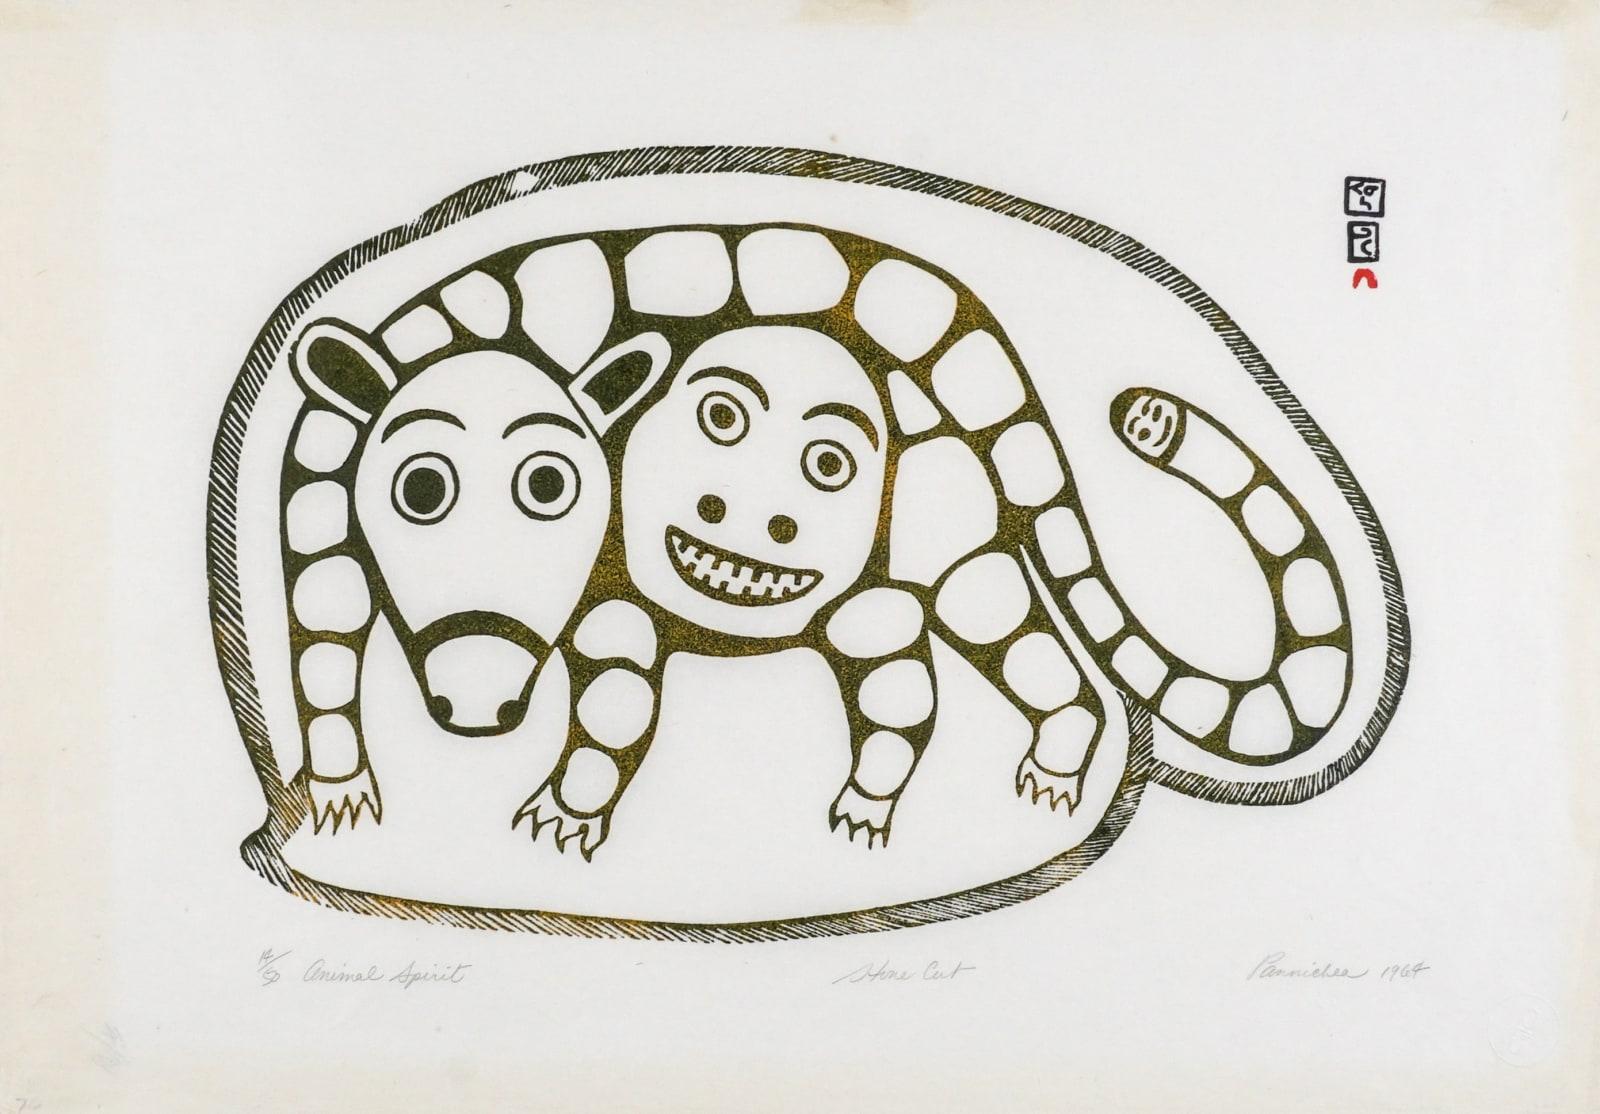 LOT 69 PAUNICHEA (PANNICHIAK MUNAMEE) (1920-1968) KINNGAIT CAPE DORSET Animal Spirit, 1964 stonecut, 15 x 24 in (38.1 x 61 cm) ESTIMATE: $300 — $500